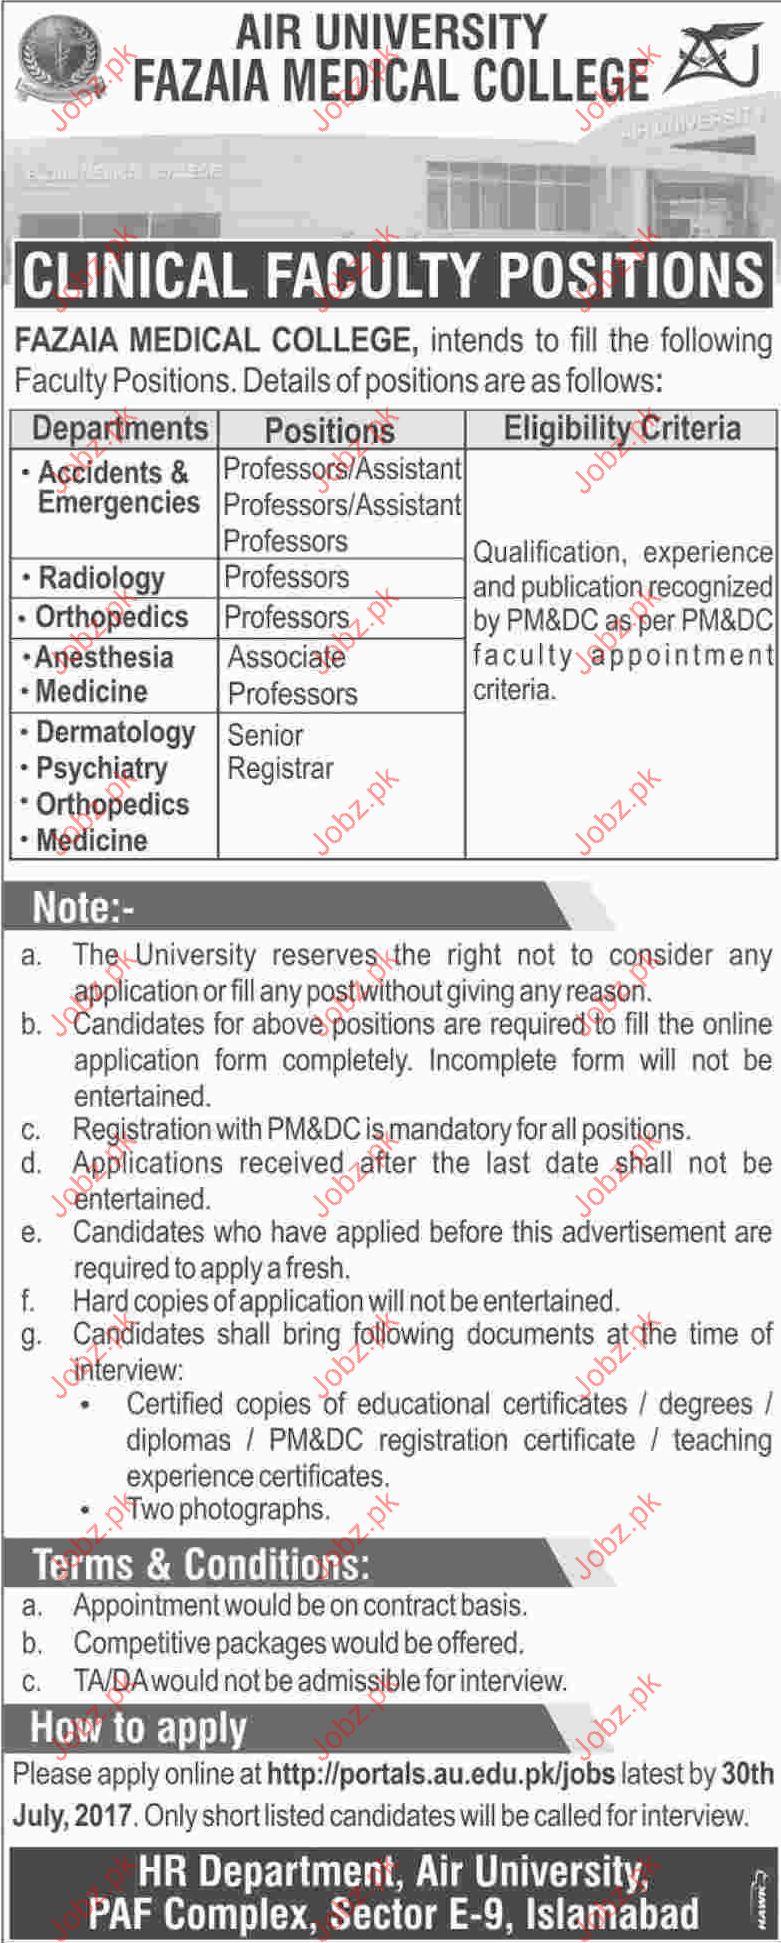 Fazaia Medical College FMC Career Opportunities